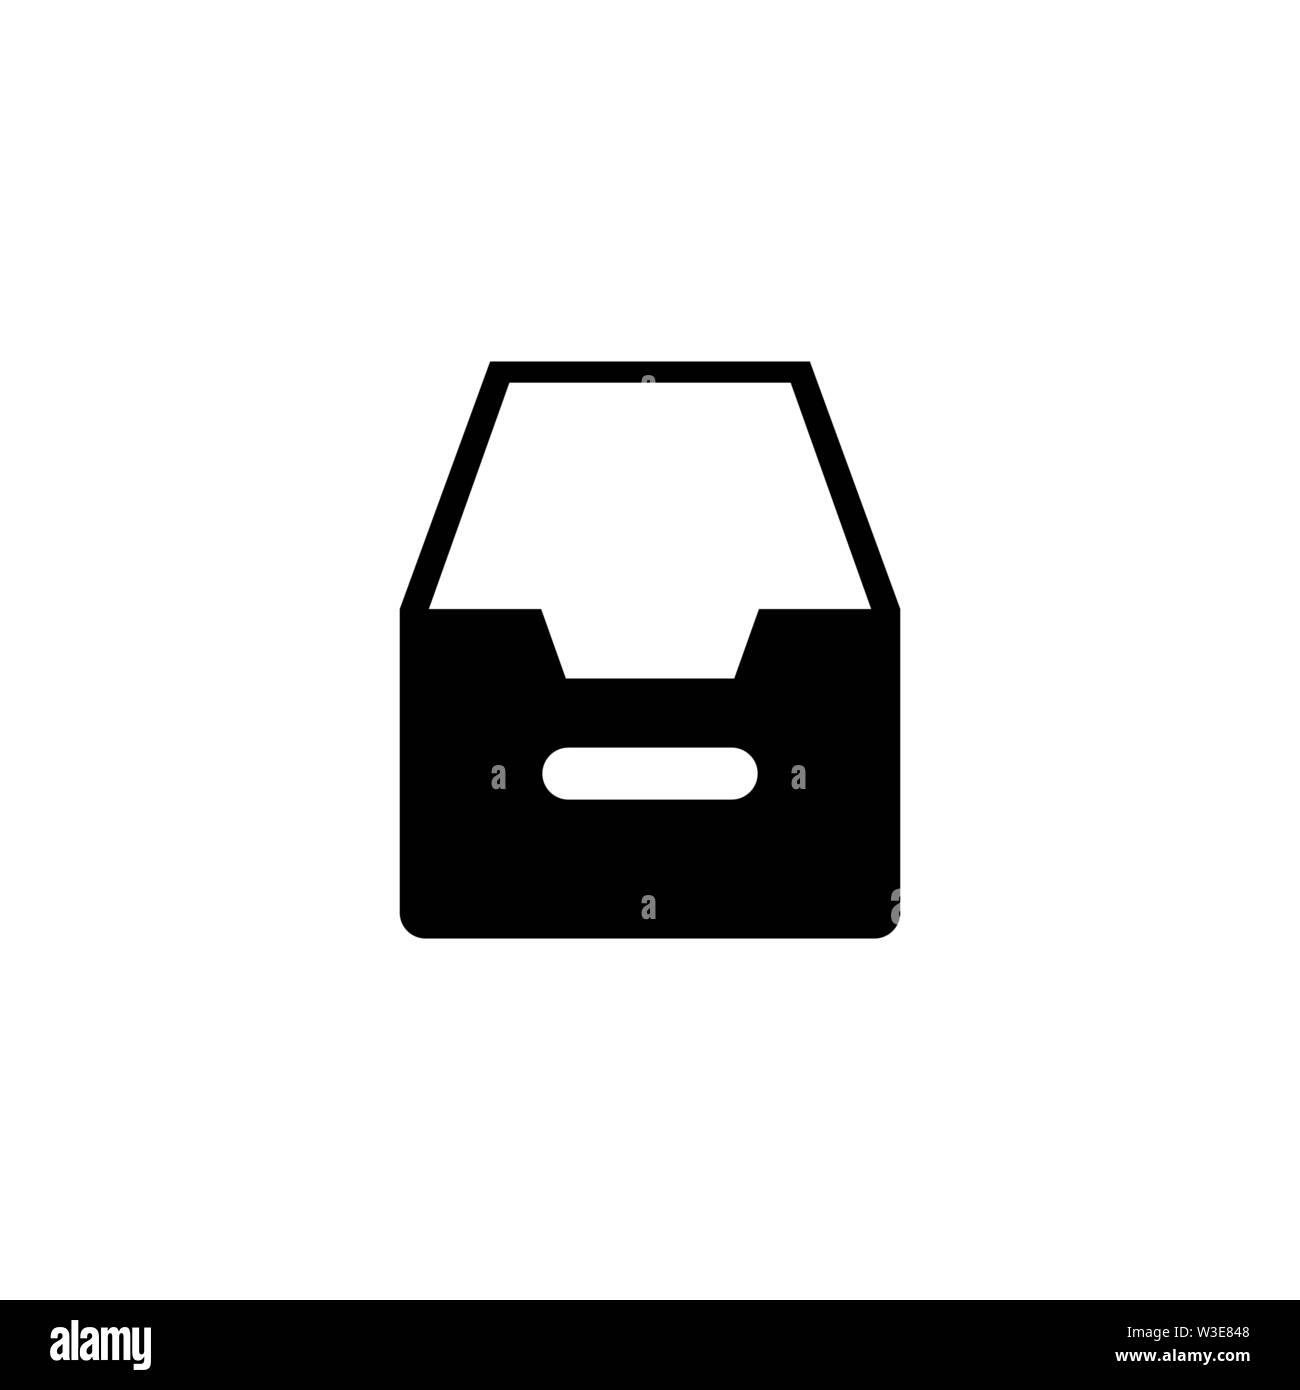 Folder Archive, Cabinet Drawer. Flat Vector Icon illustration. Simple black symbol on white background. Folder Archive, Cabinet Drawer sign design tem - Stock Image